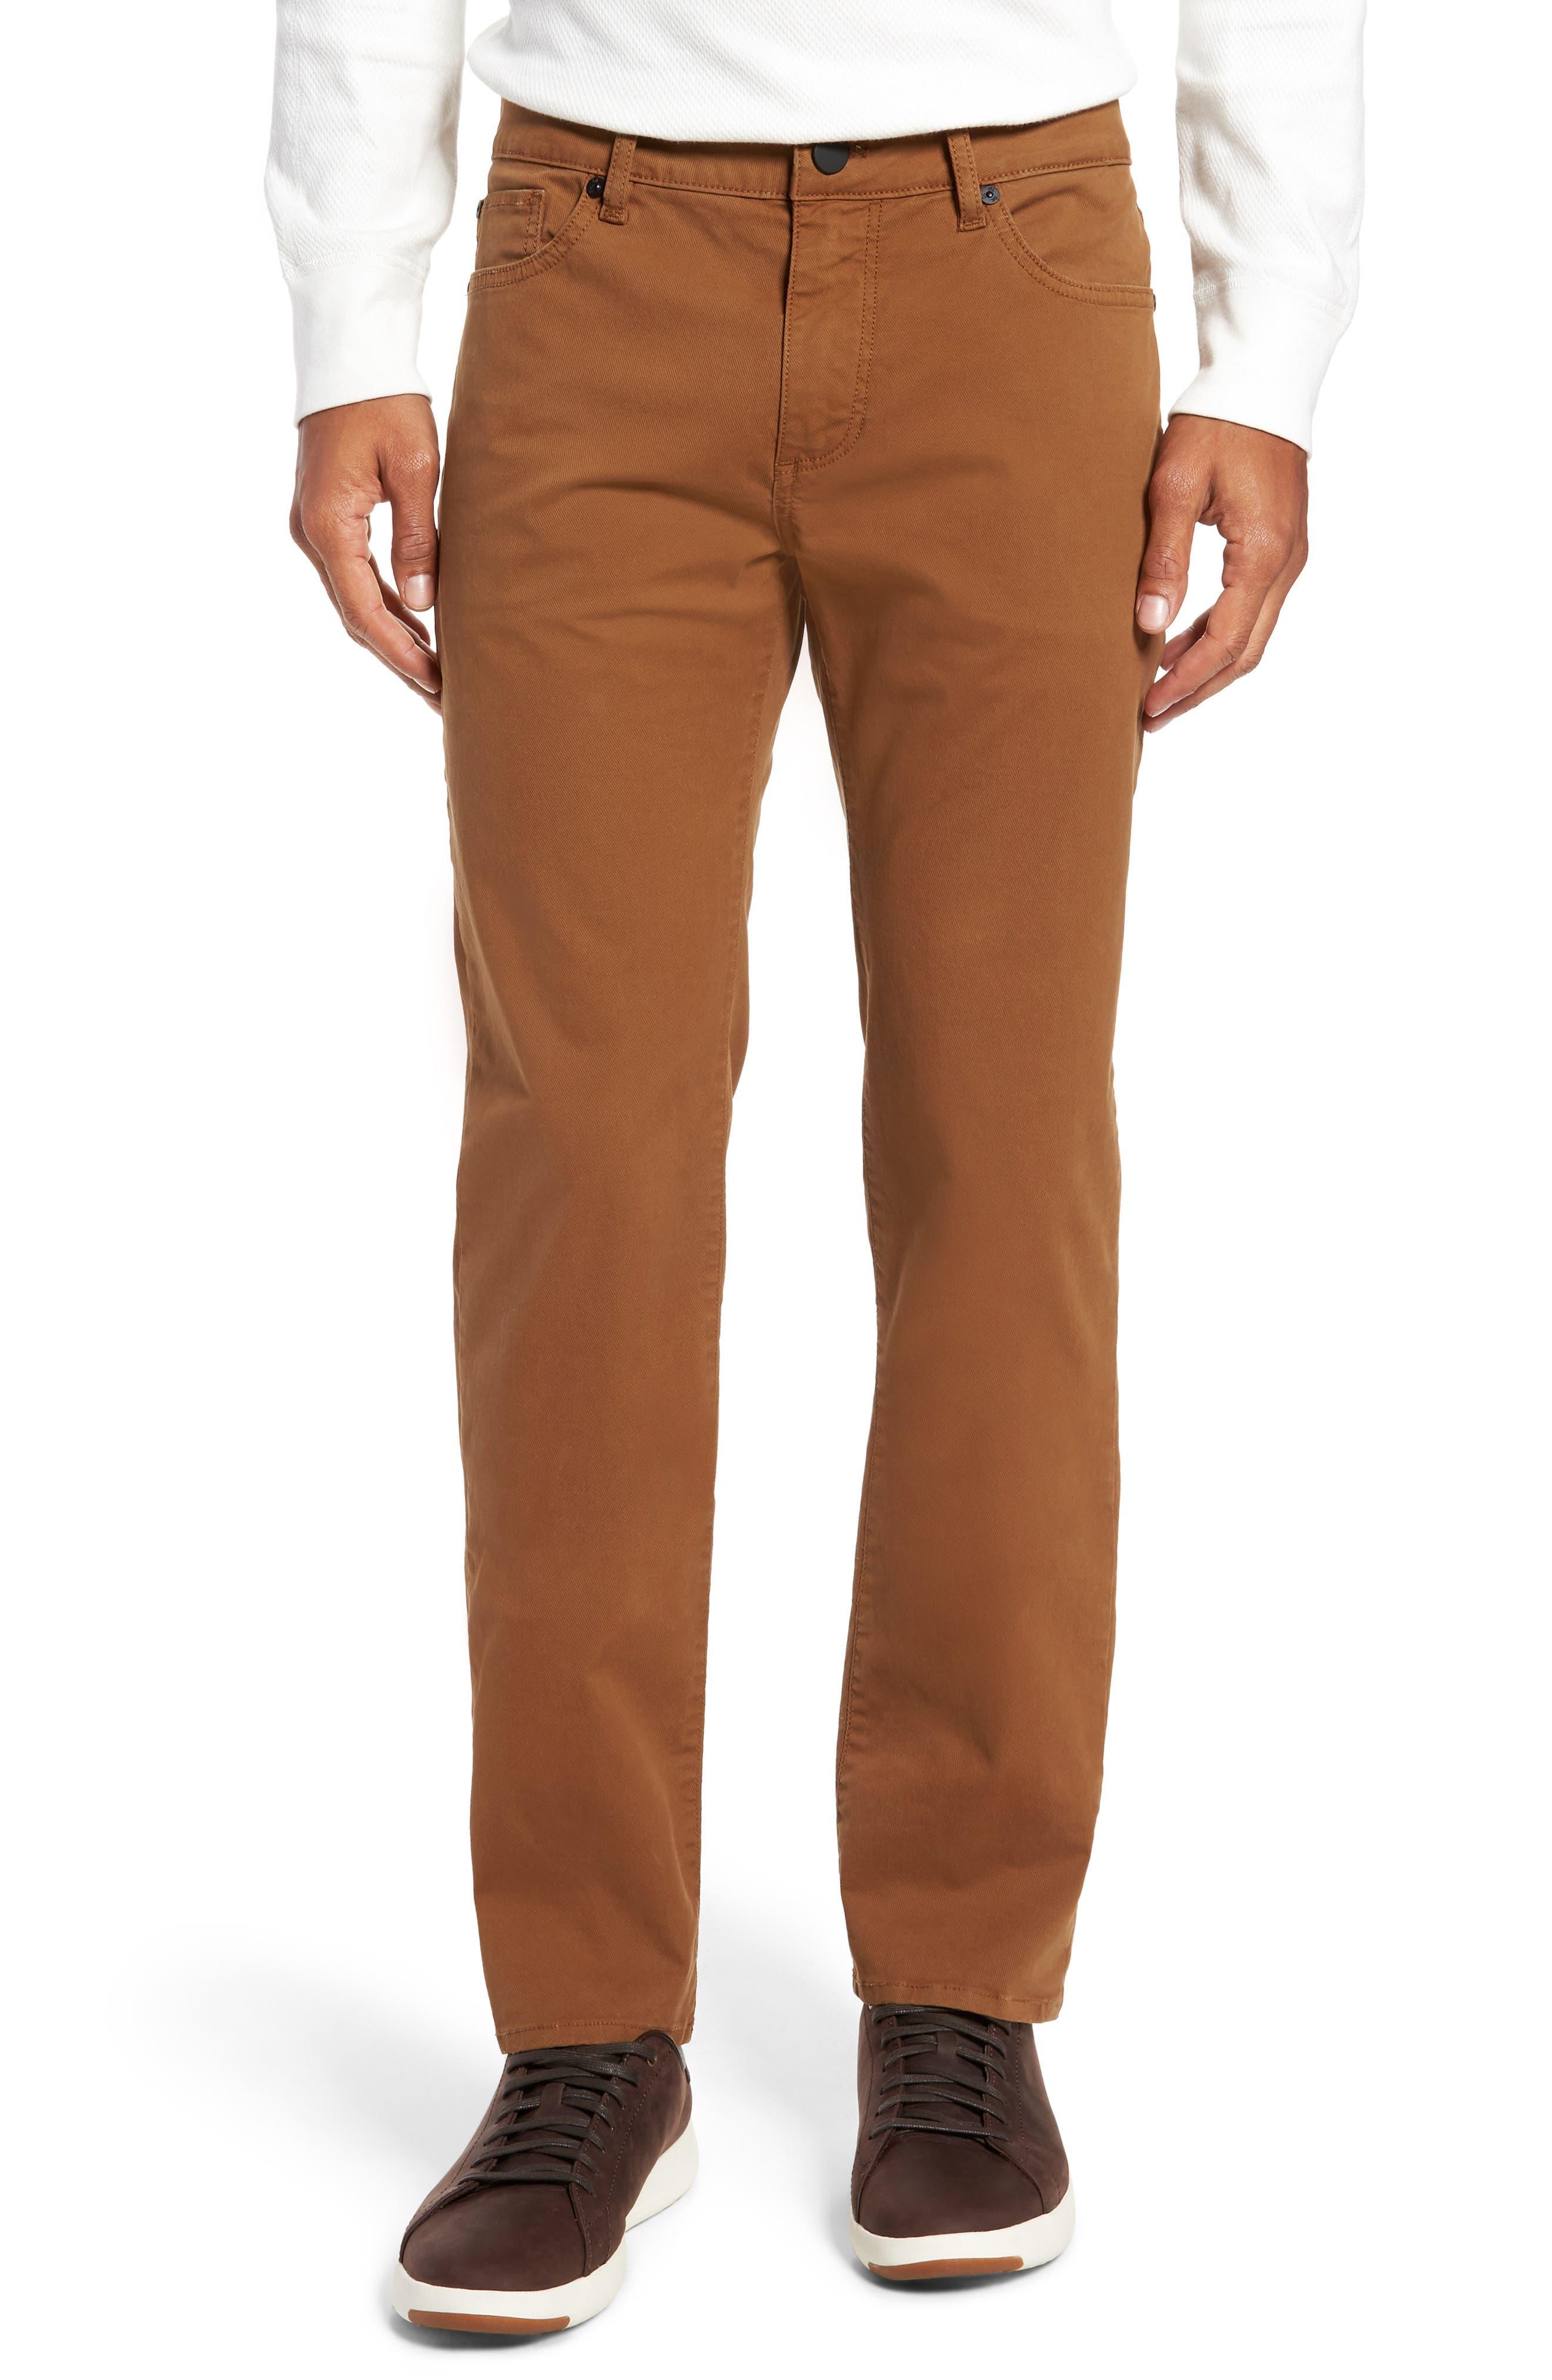 Alternate Image 1 Selected - DL1961 Nick Slim Fit Flat Front Pants